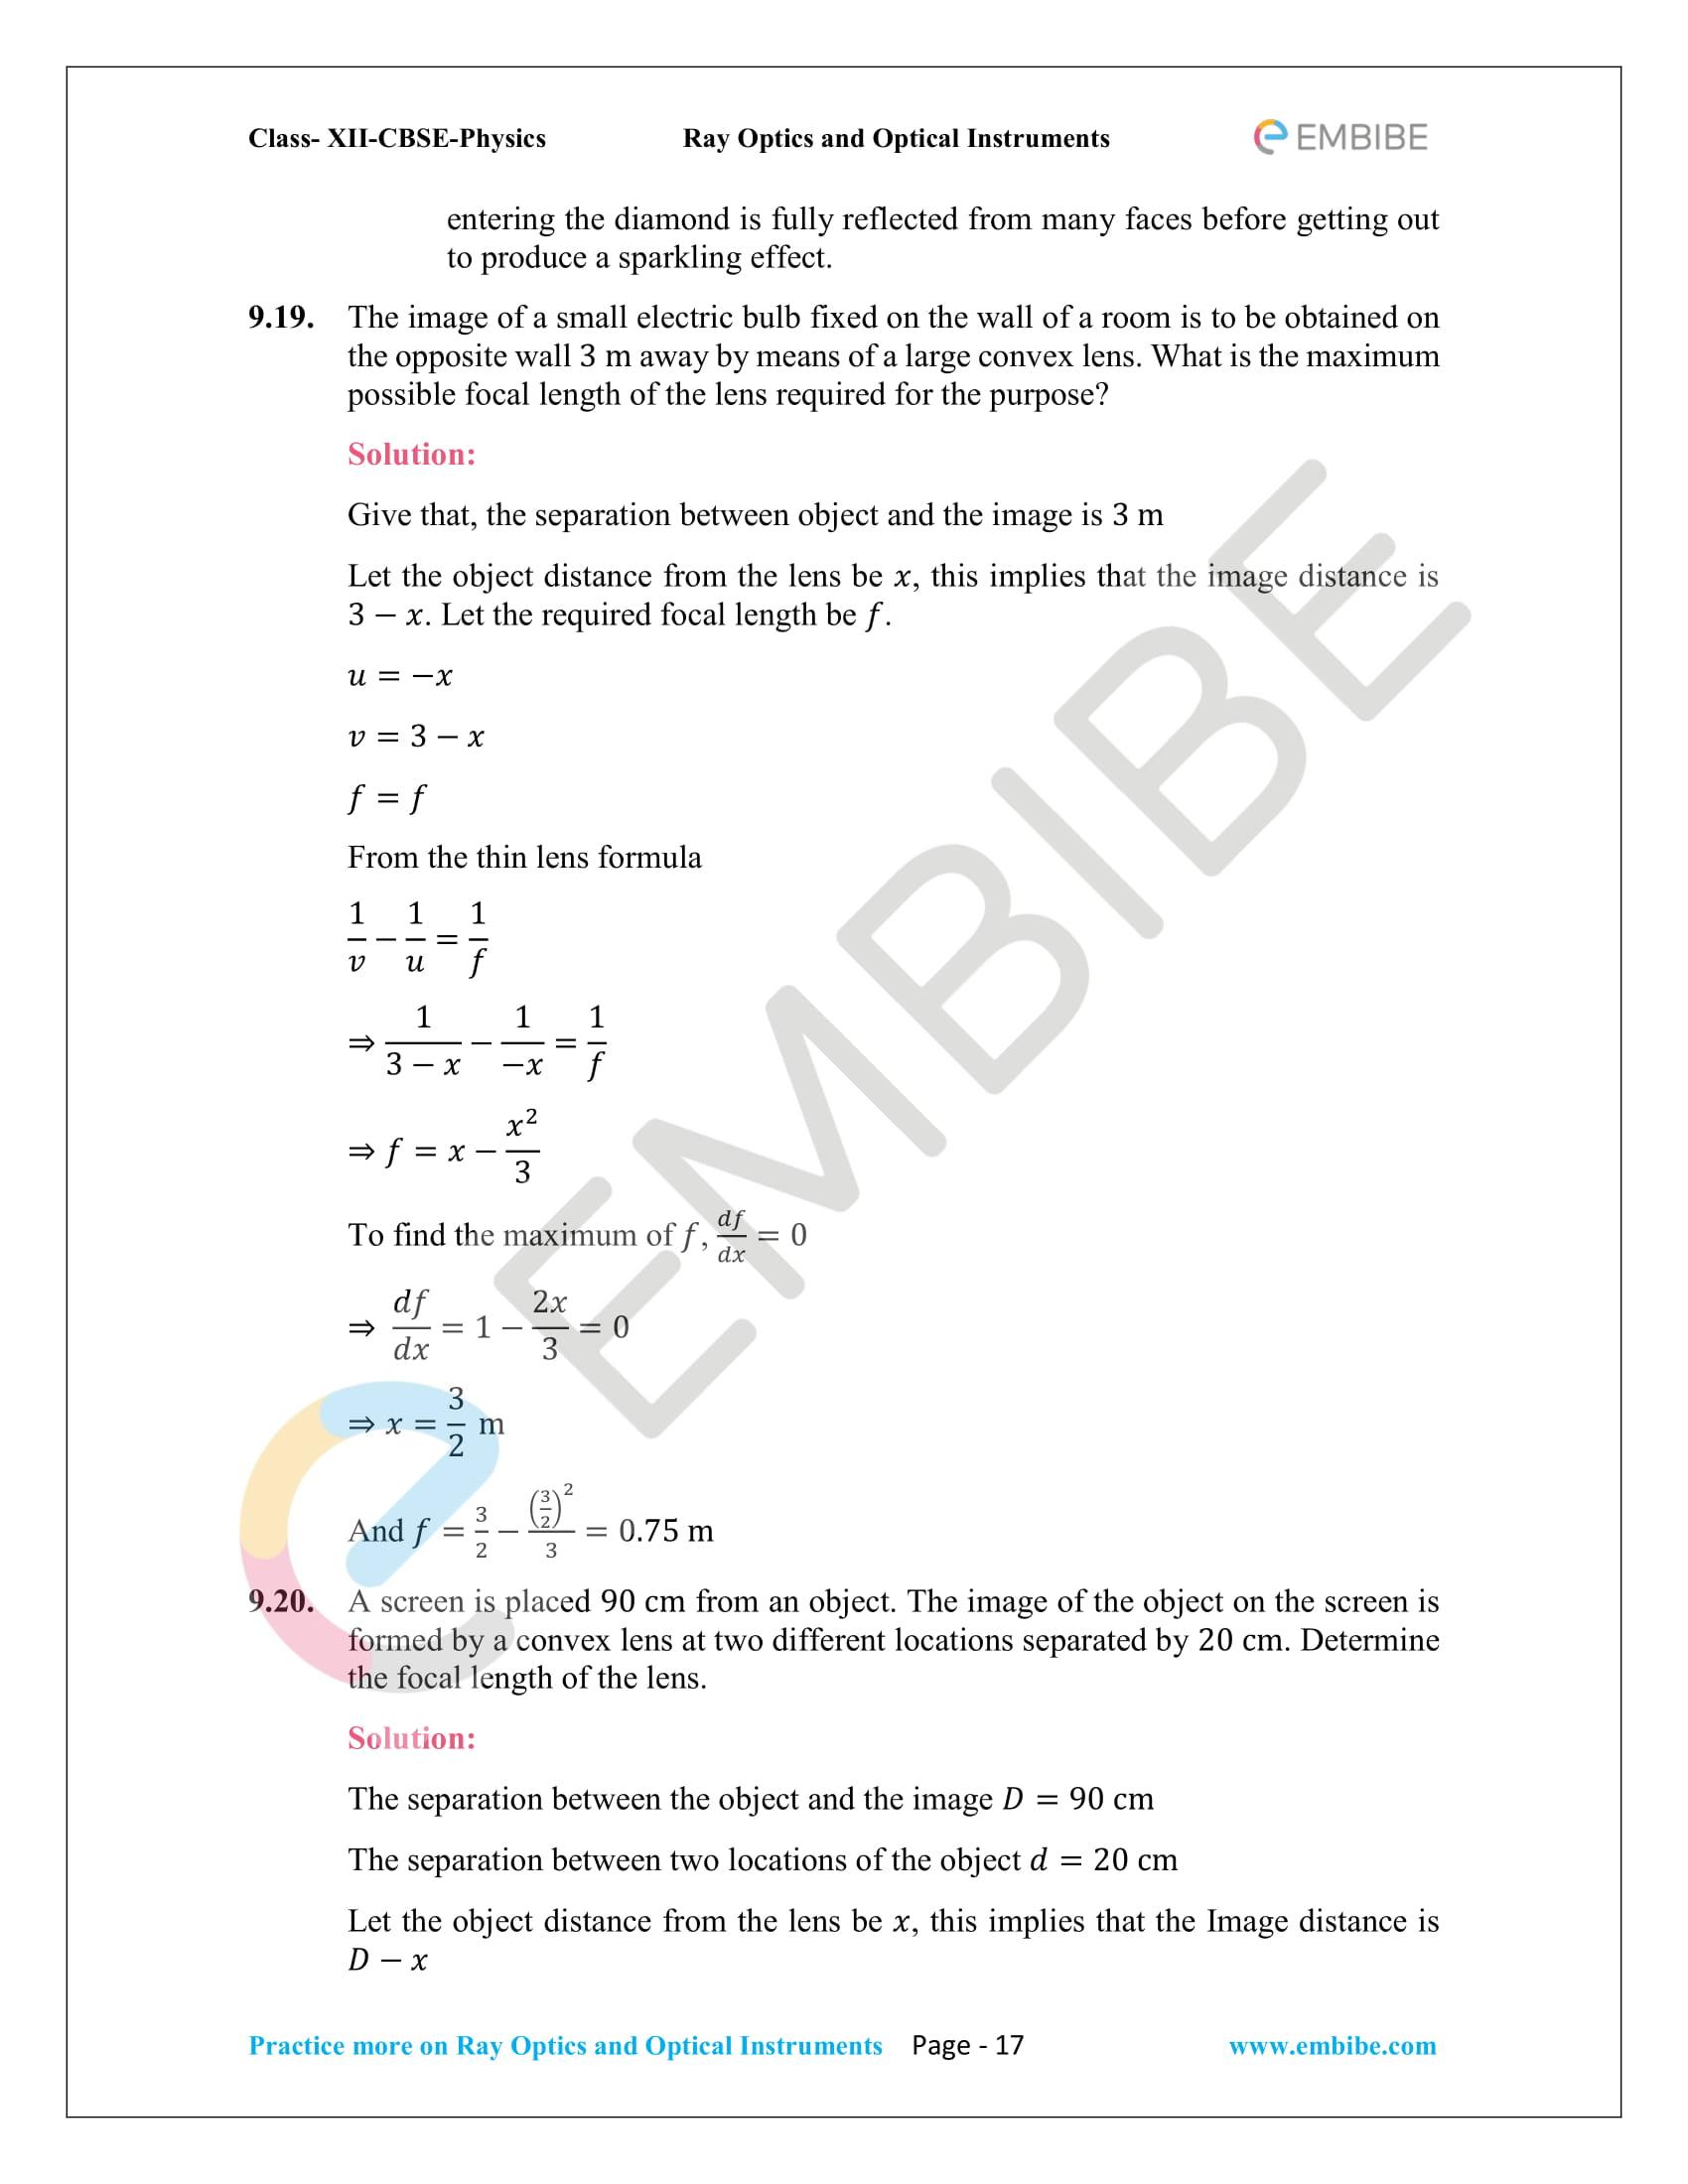 NCERT_Grade 12_Physics_Ch_09_Ray Optics-17